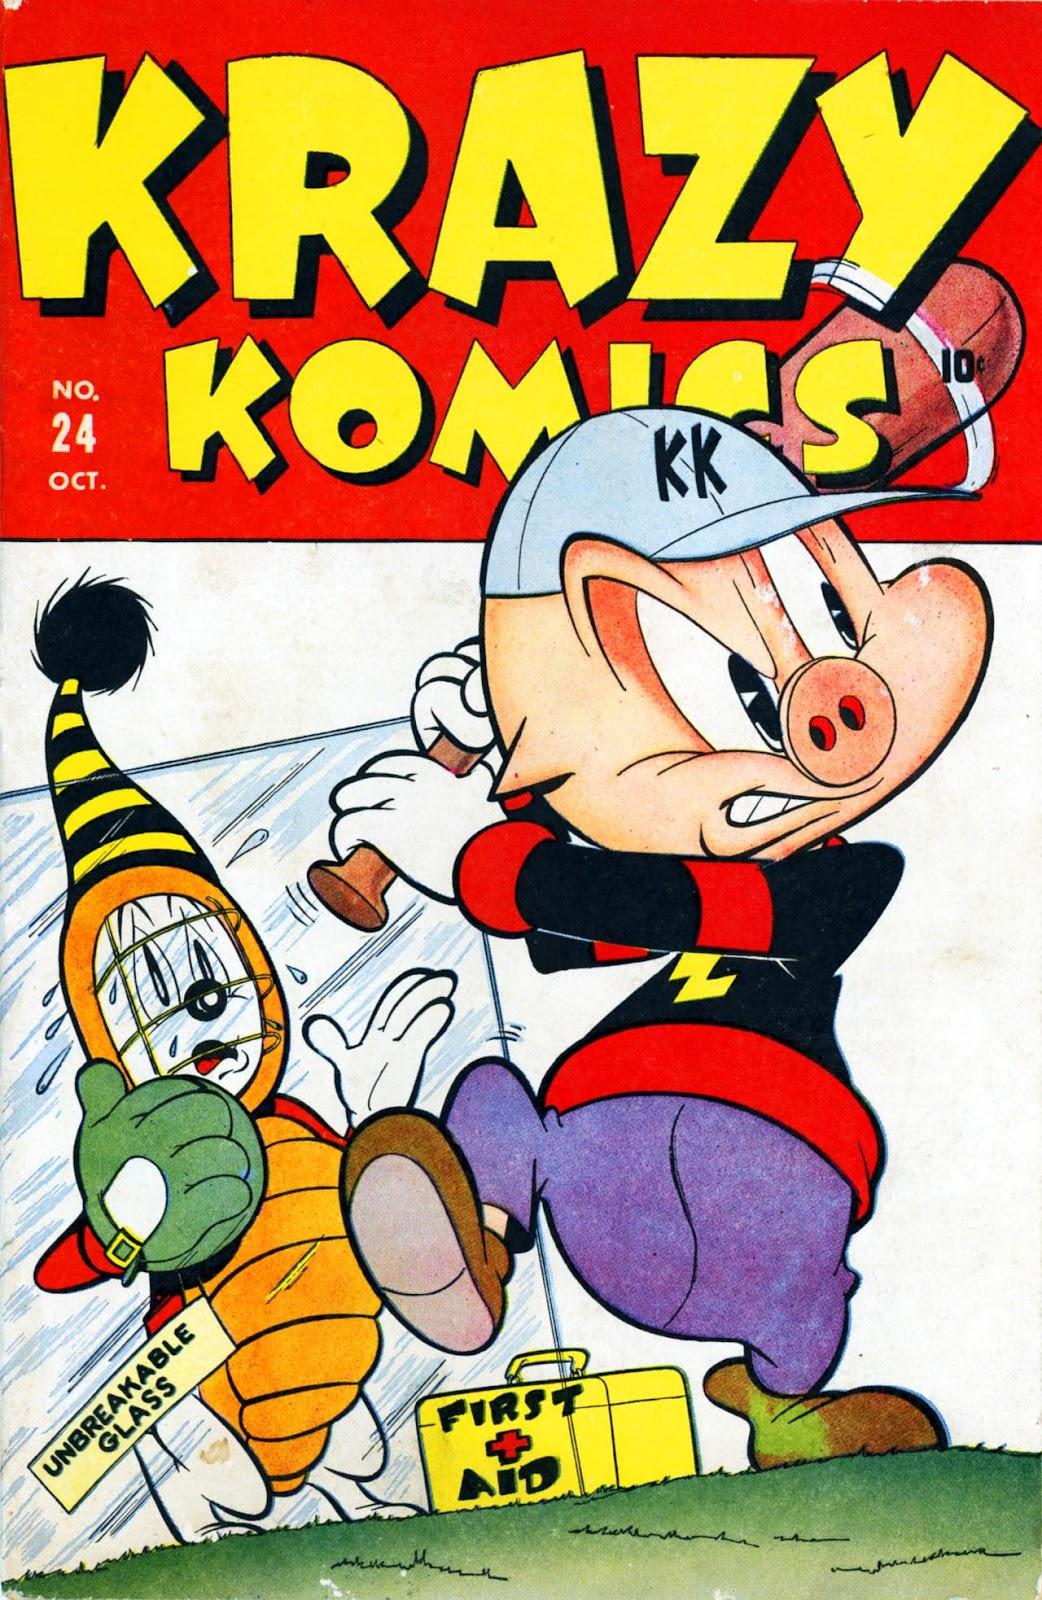 Krazy Komics issue 24 - Page 1